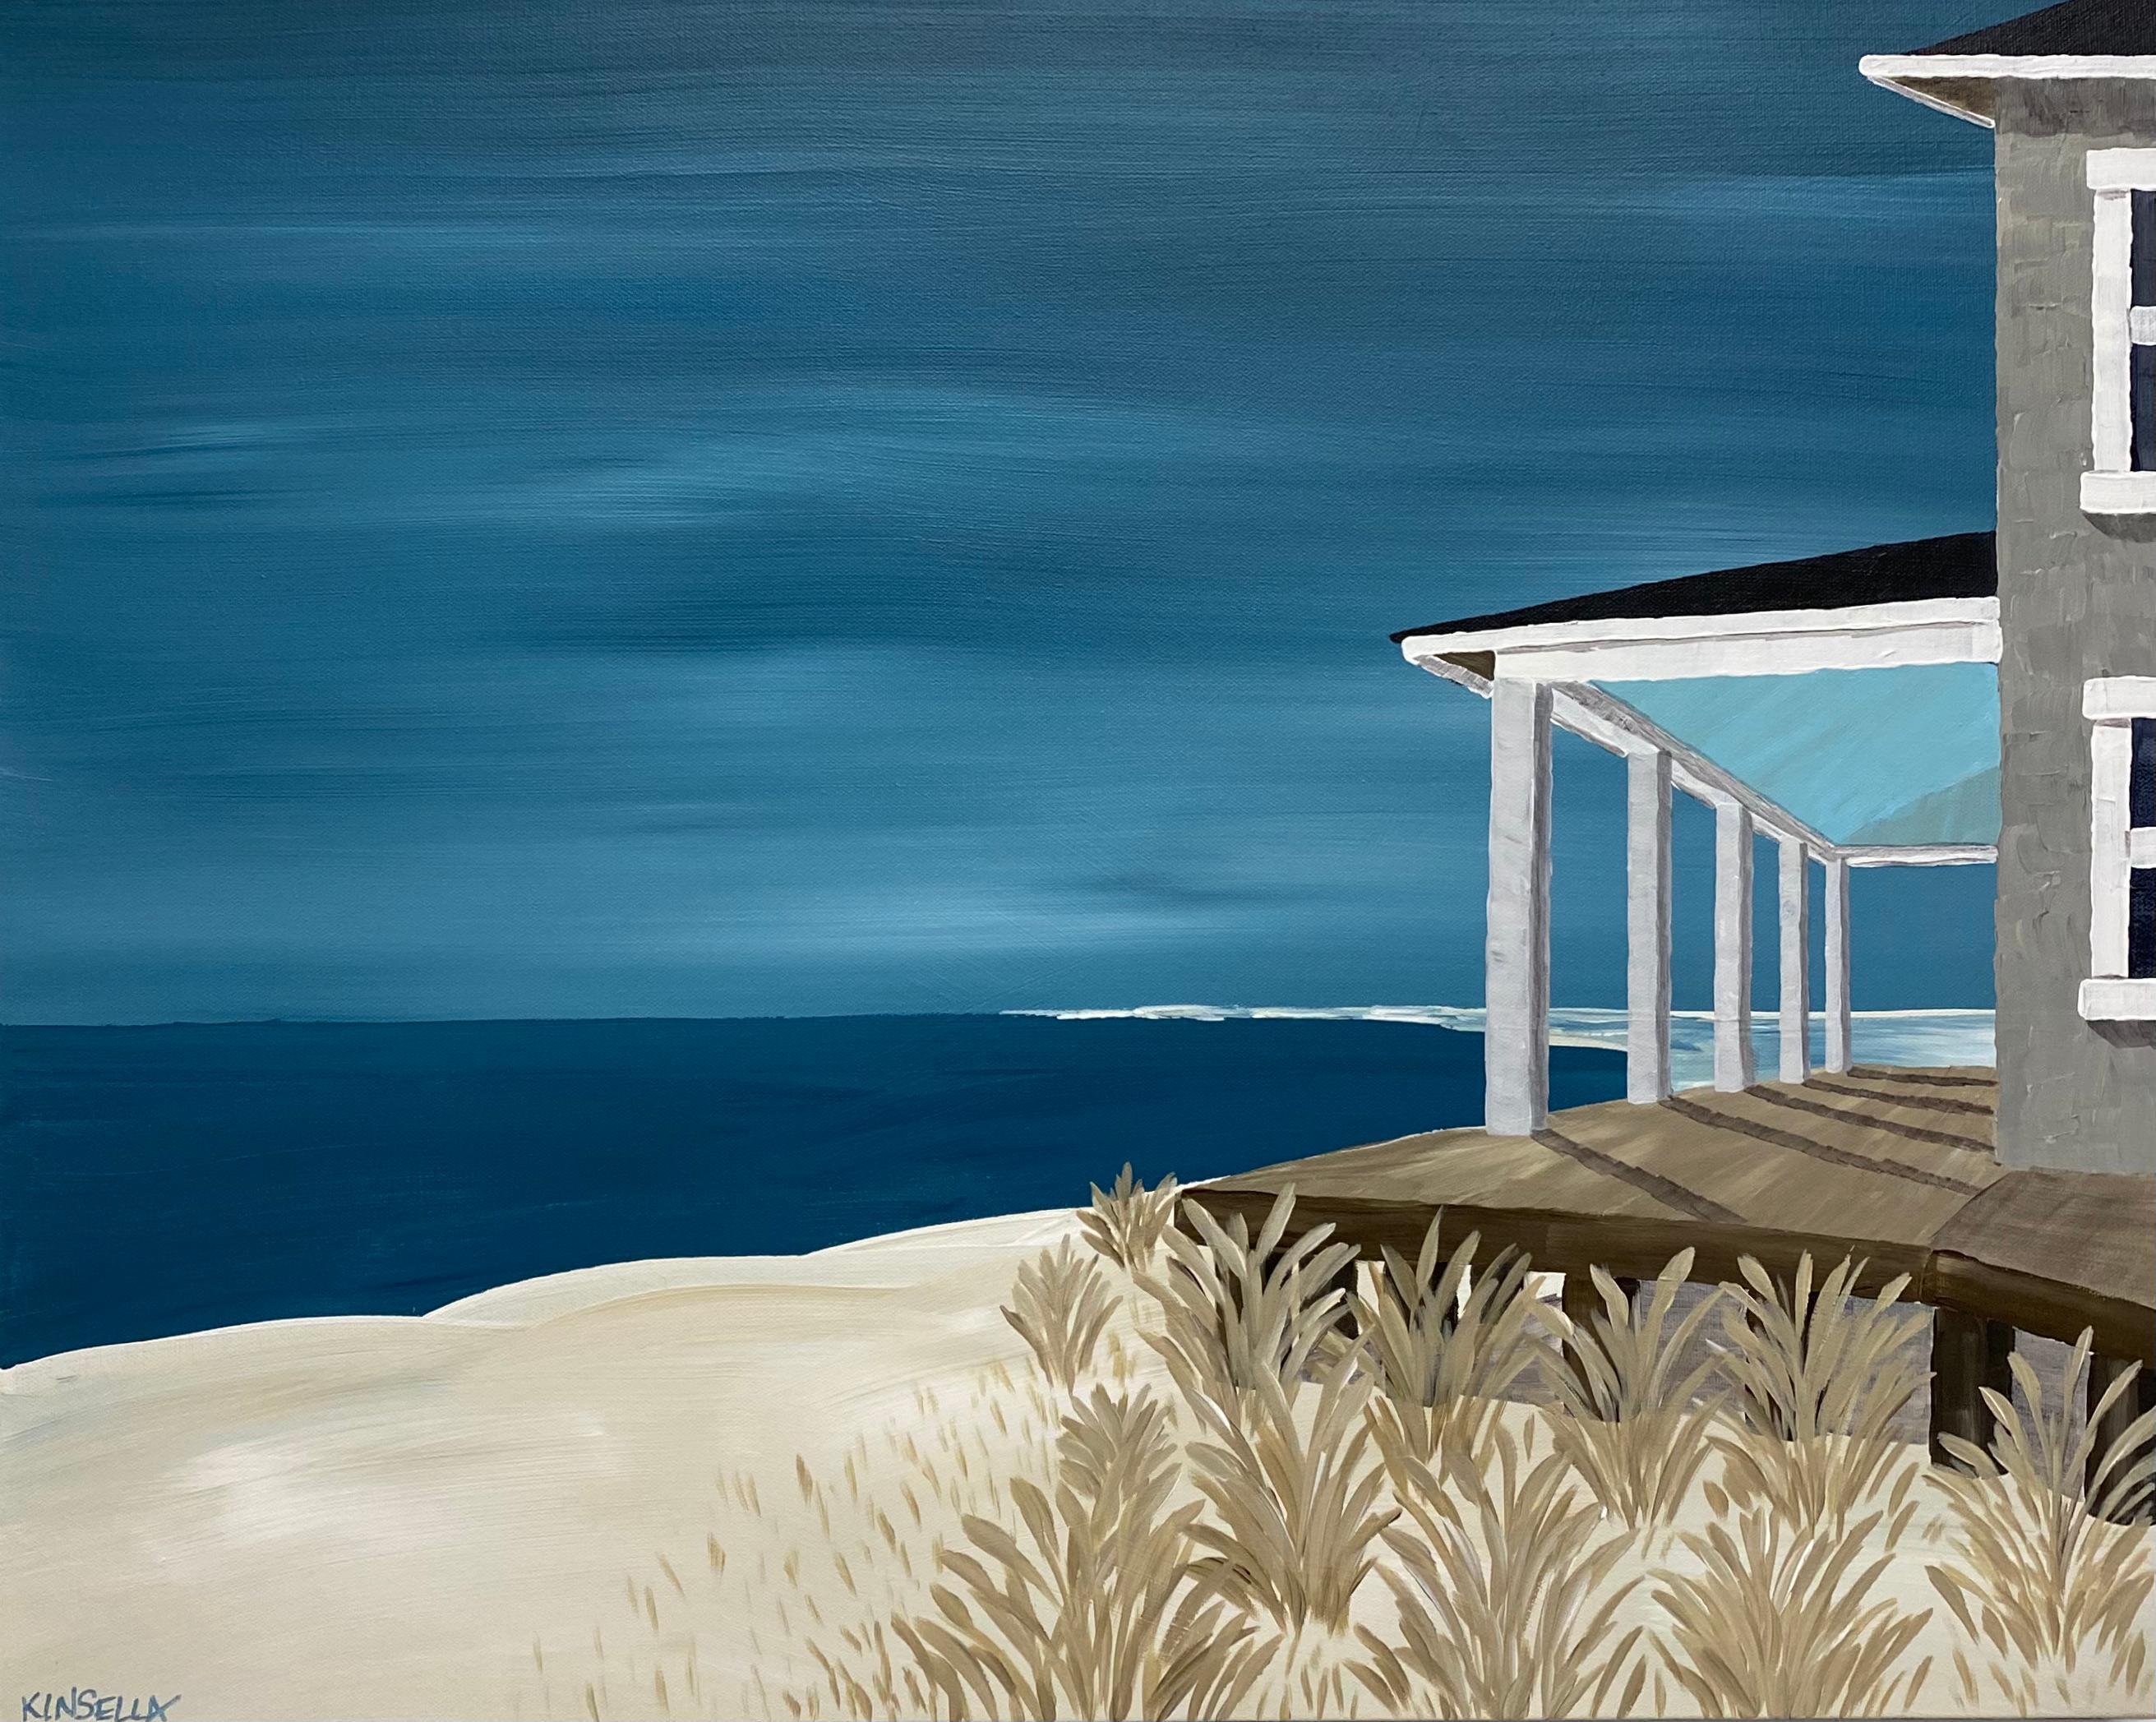 Sea Oats Susan Kinsella, Landscape Acrylic on Canvas Painting